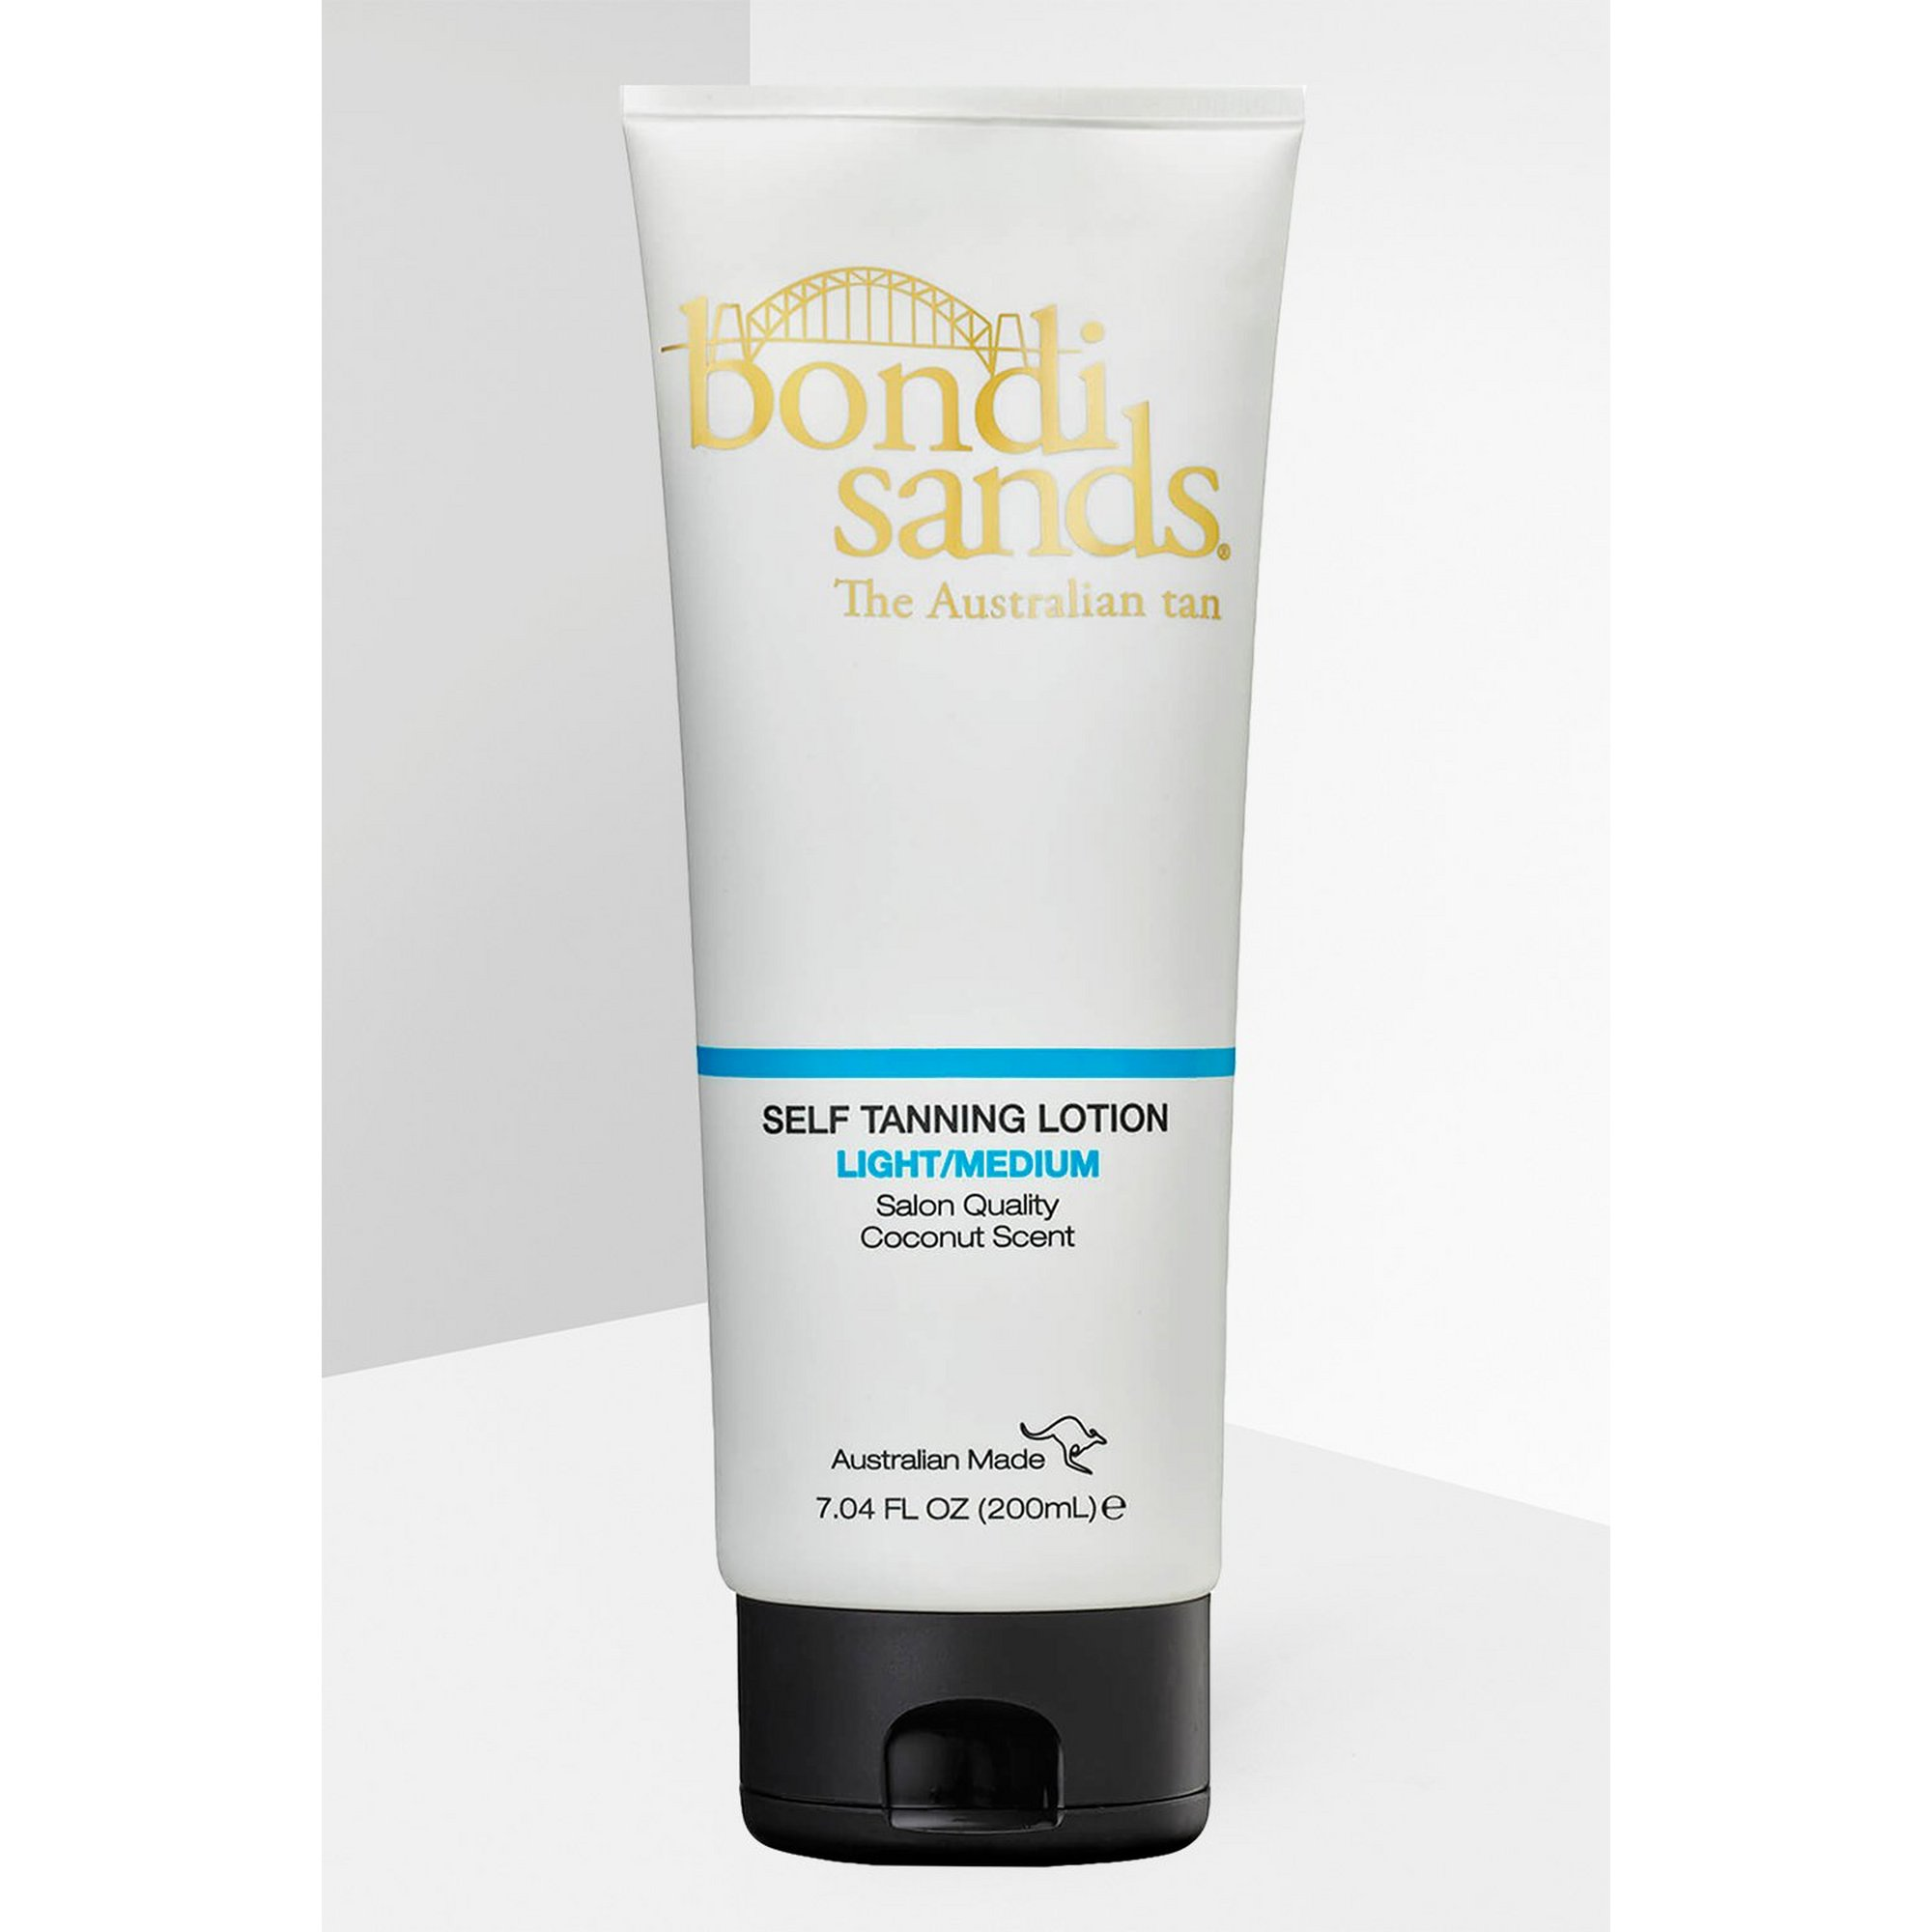 Image of Bondi Sands Self Tanning Lotion Light/Medium